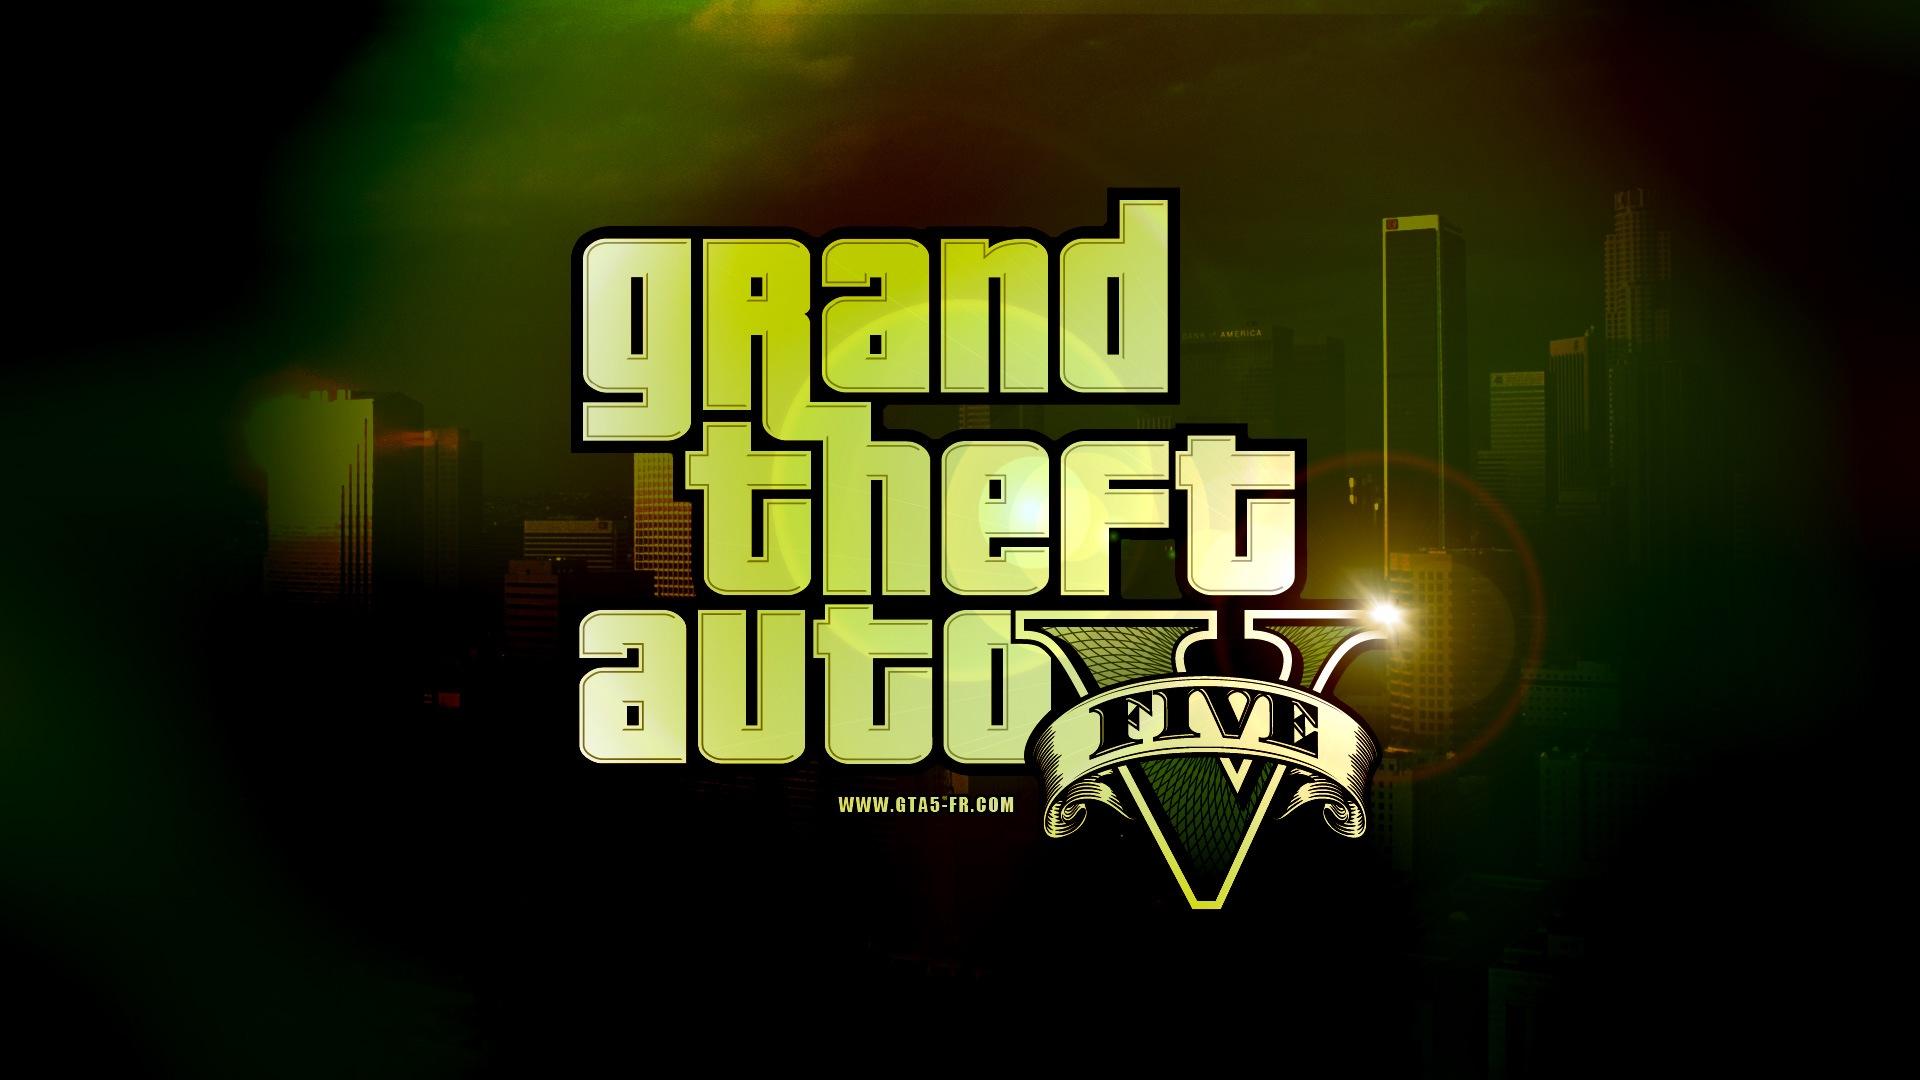 Grand theft auto v gta 5 hd spiel wallpapers 10 for Gta v bedroom wallpaper